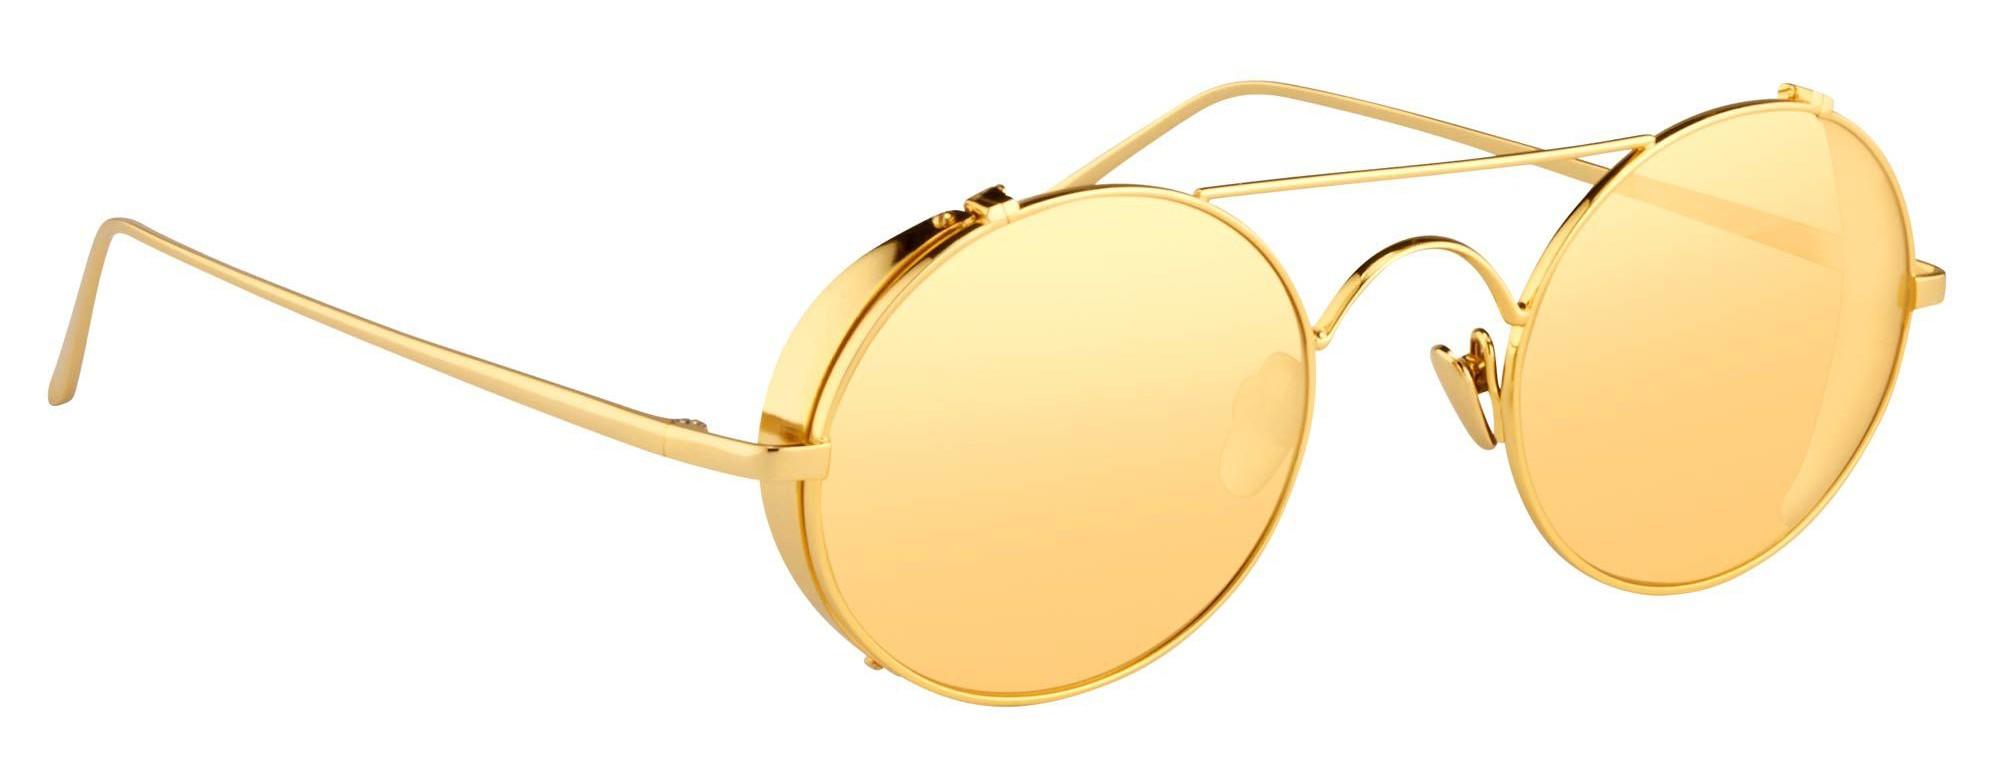 a520a362471 Linda Farrow - 427 C1 Oval Sunglasses - Yellow Gold - Linda Farrow Eyewear  - Gigi Hagid - Elle Macpherson - Official - Avvenice